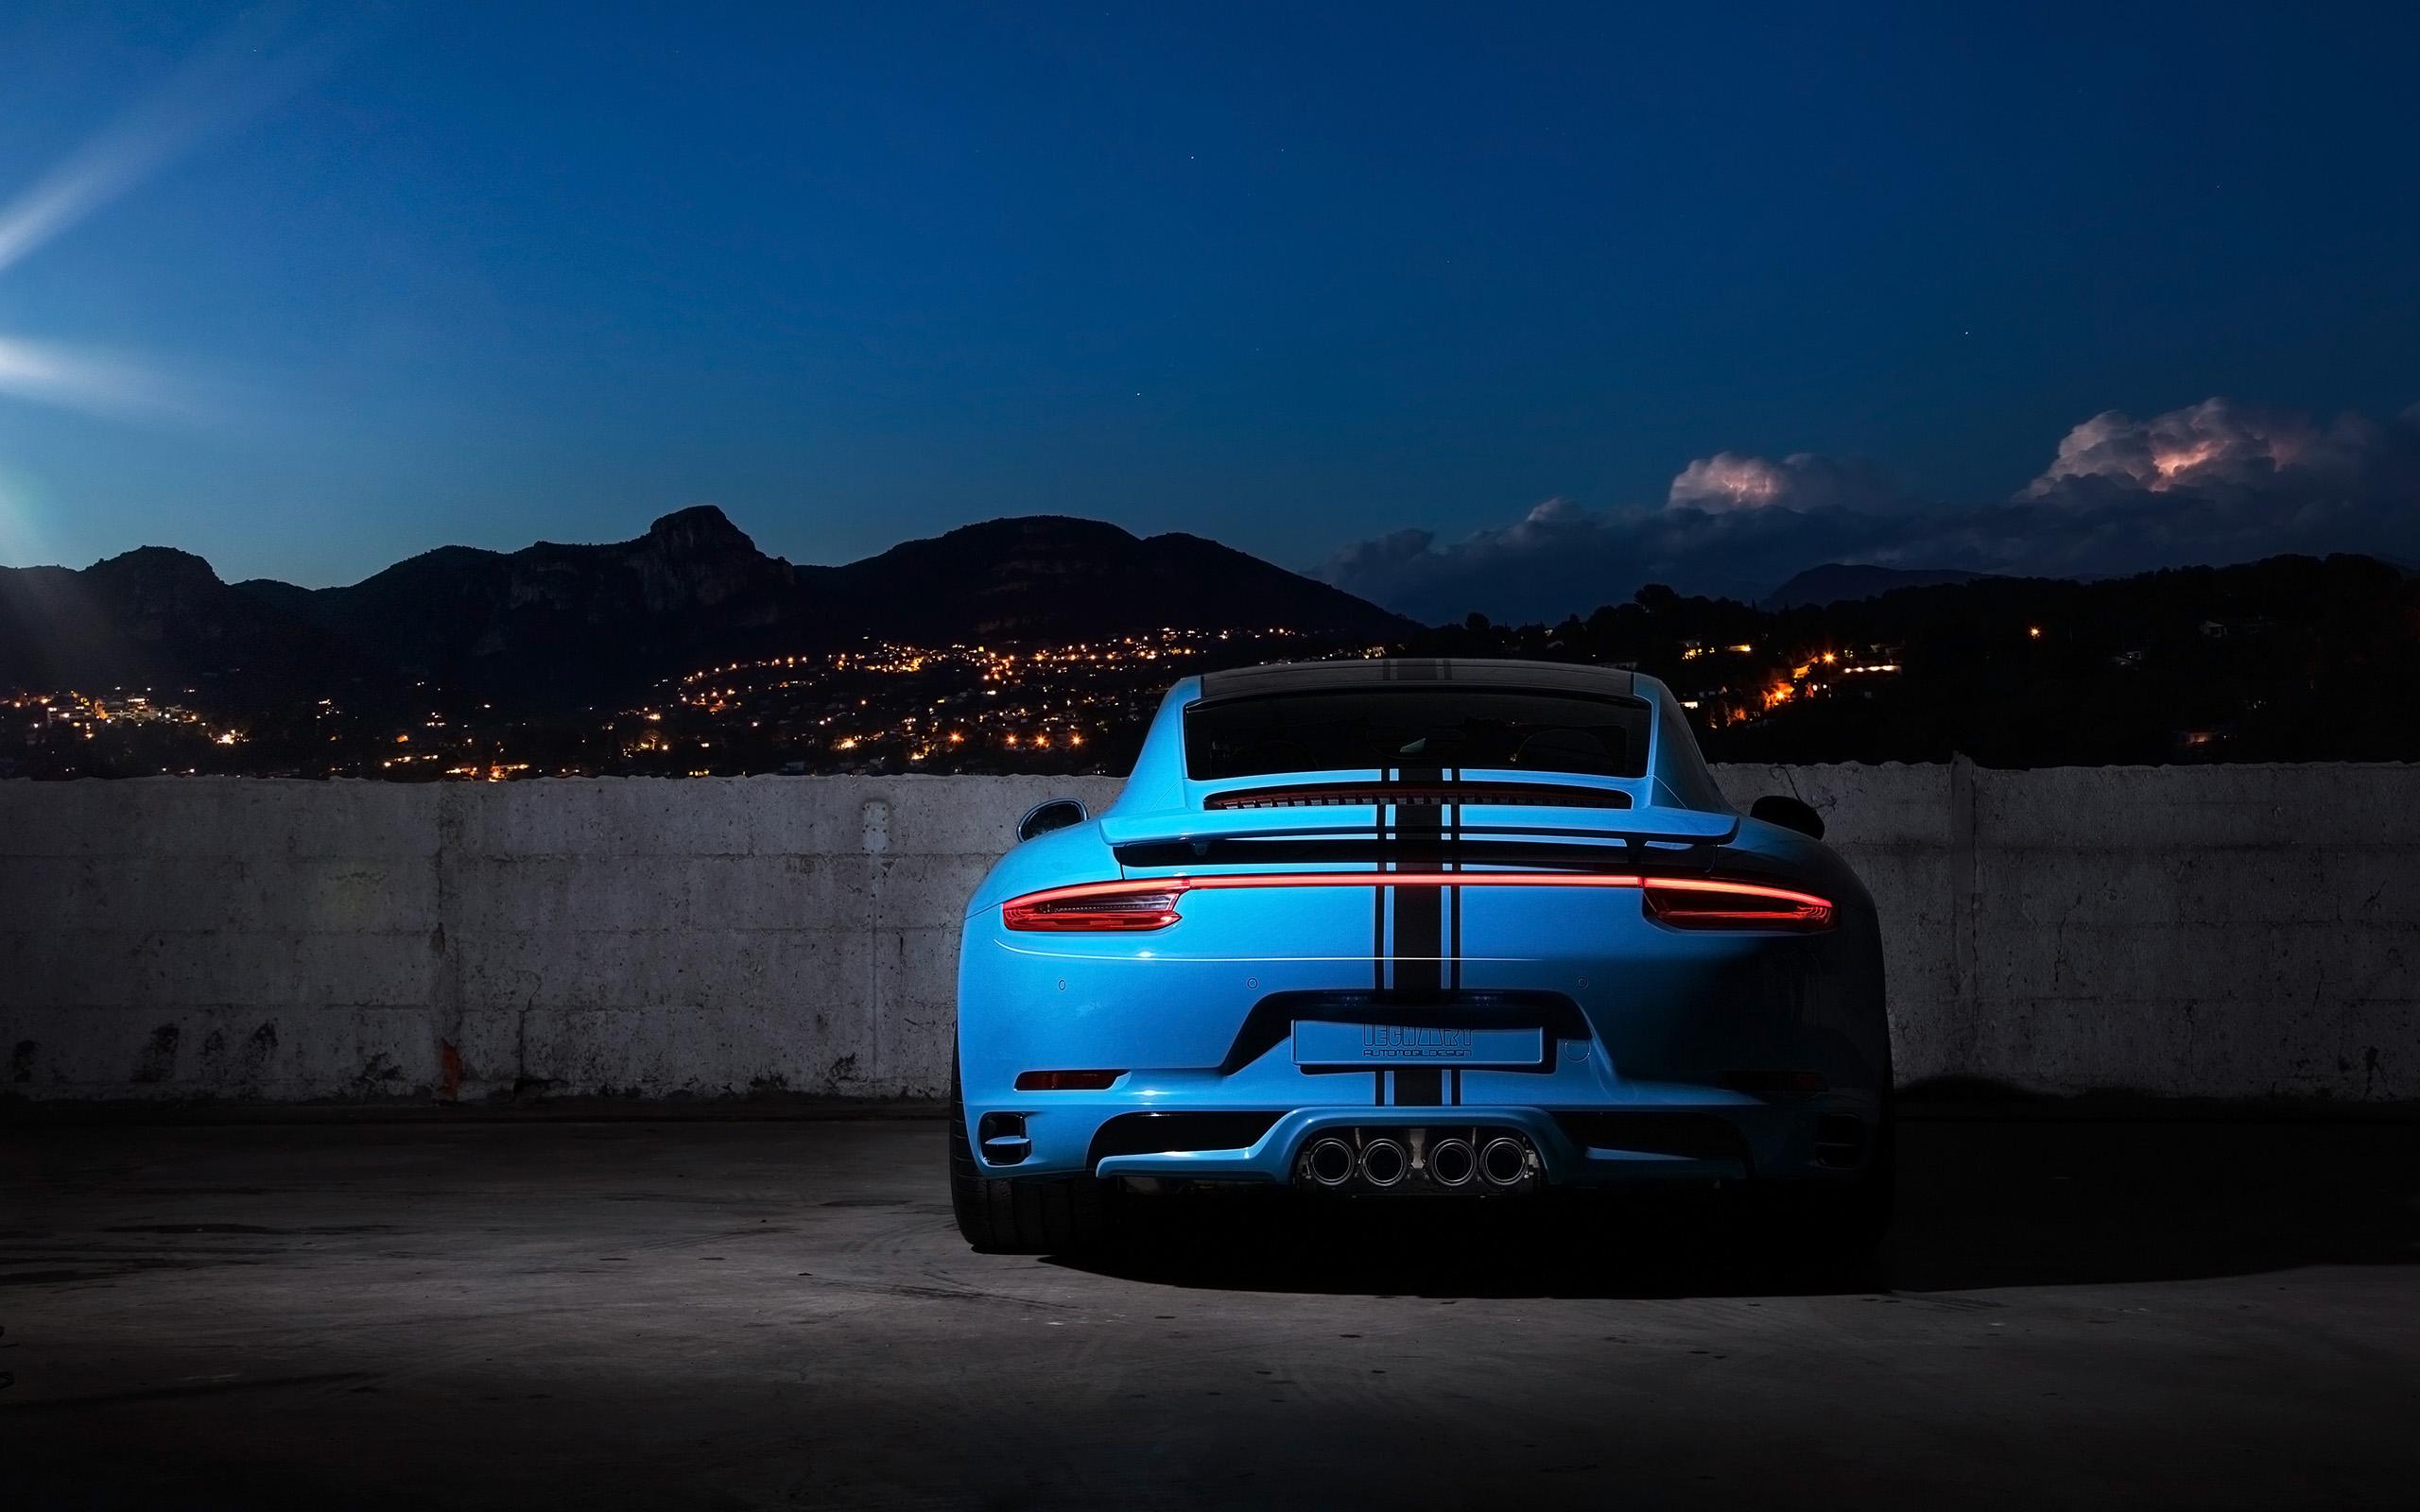 Maserati Wallpaper Iphone X 2016 Techart Porsche 911 Coupe 2 Wallpaper Hd Car